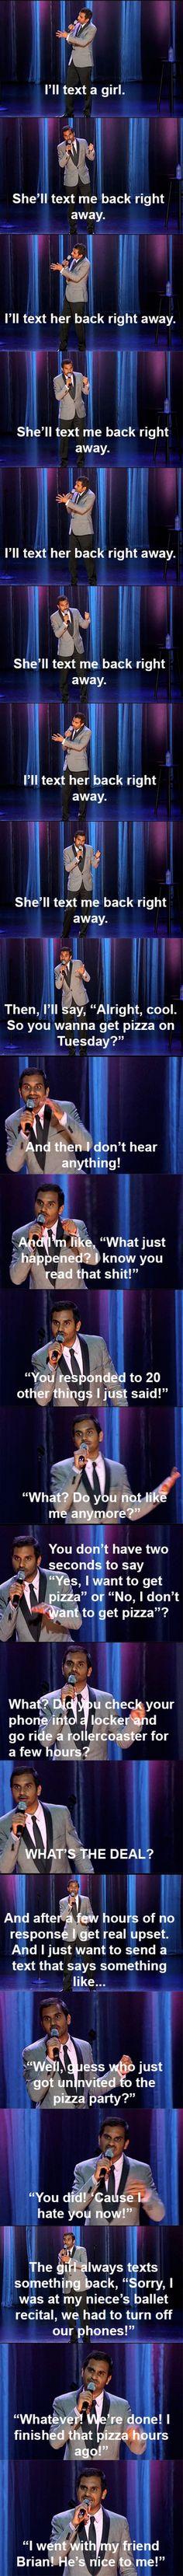 I love Aziz! He was so hilarious when I saw him live.